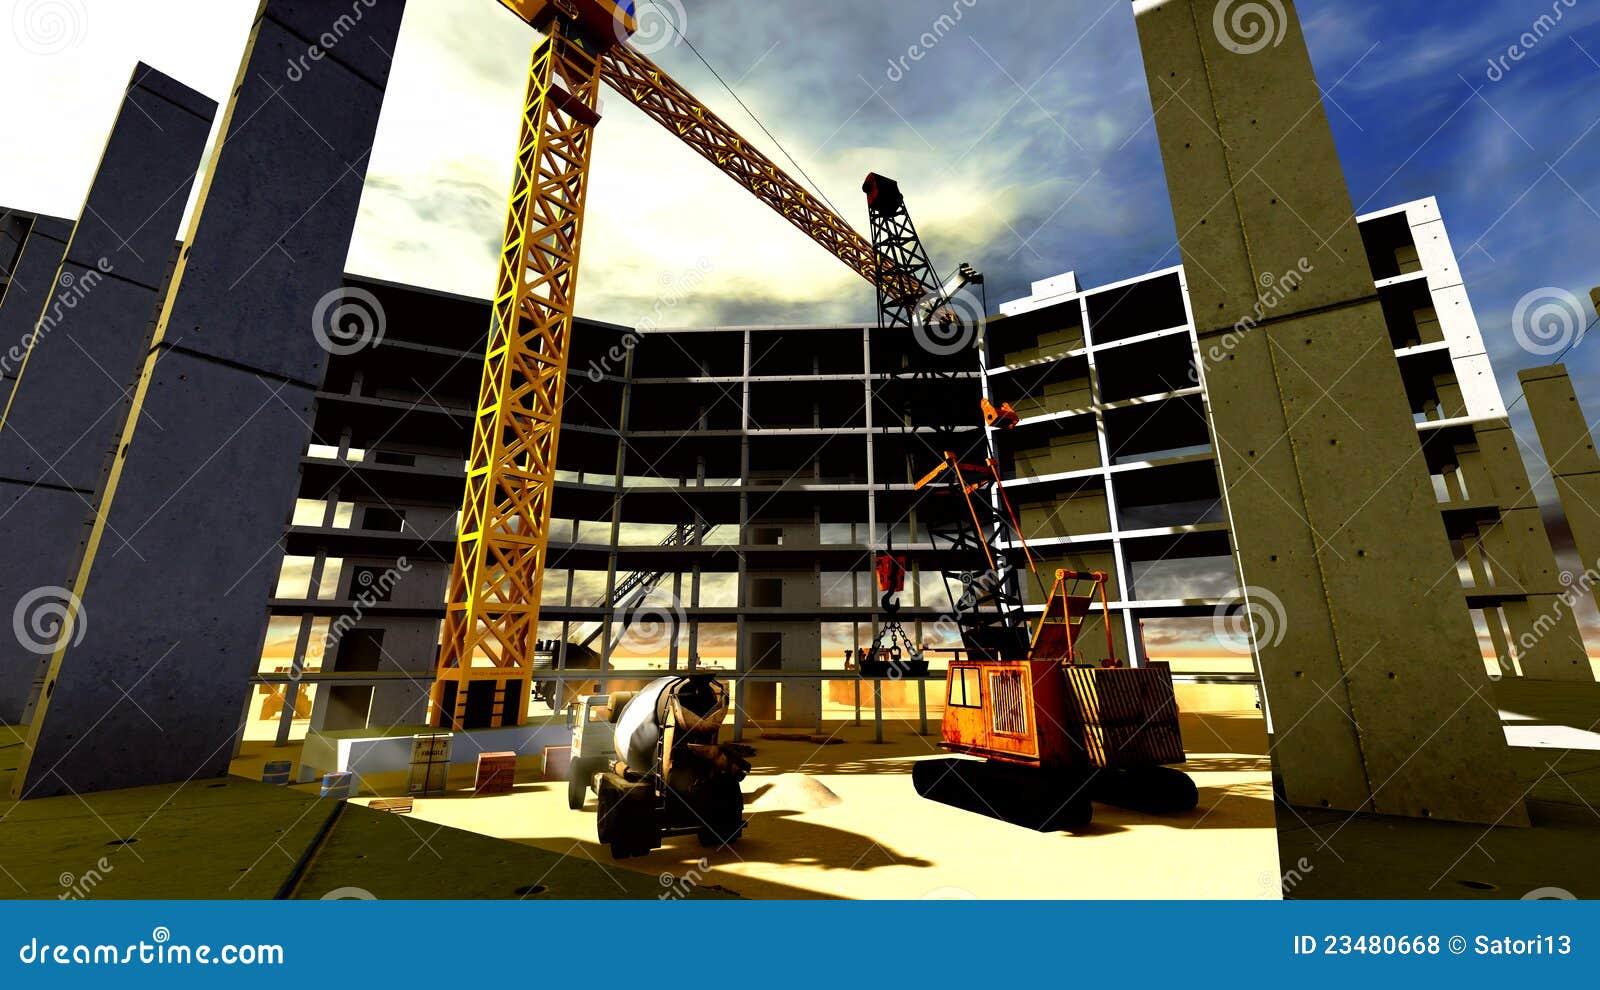 Chantier de construction illustration stock illustration for Chantiers de construction